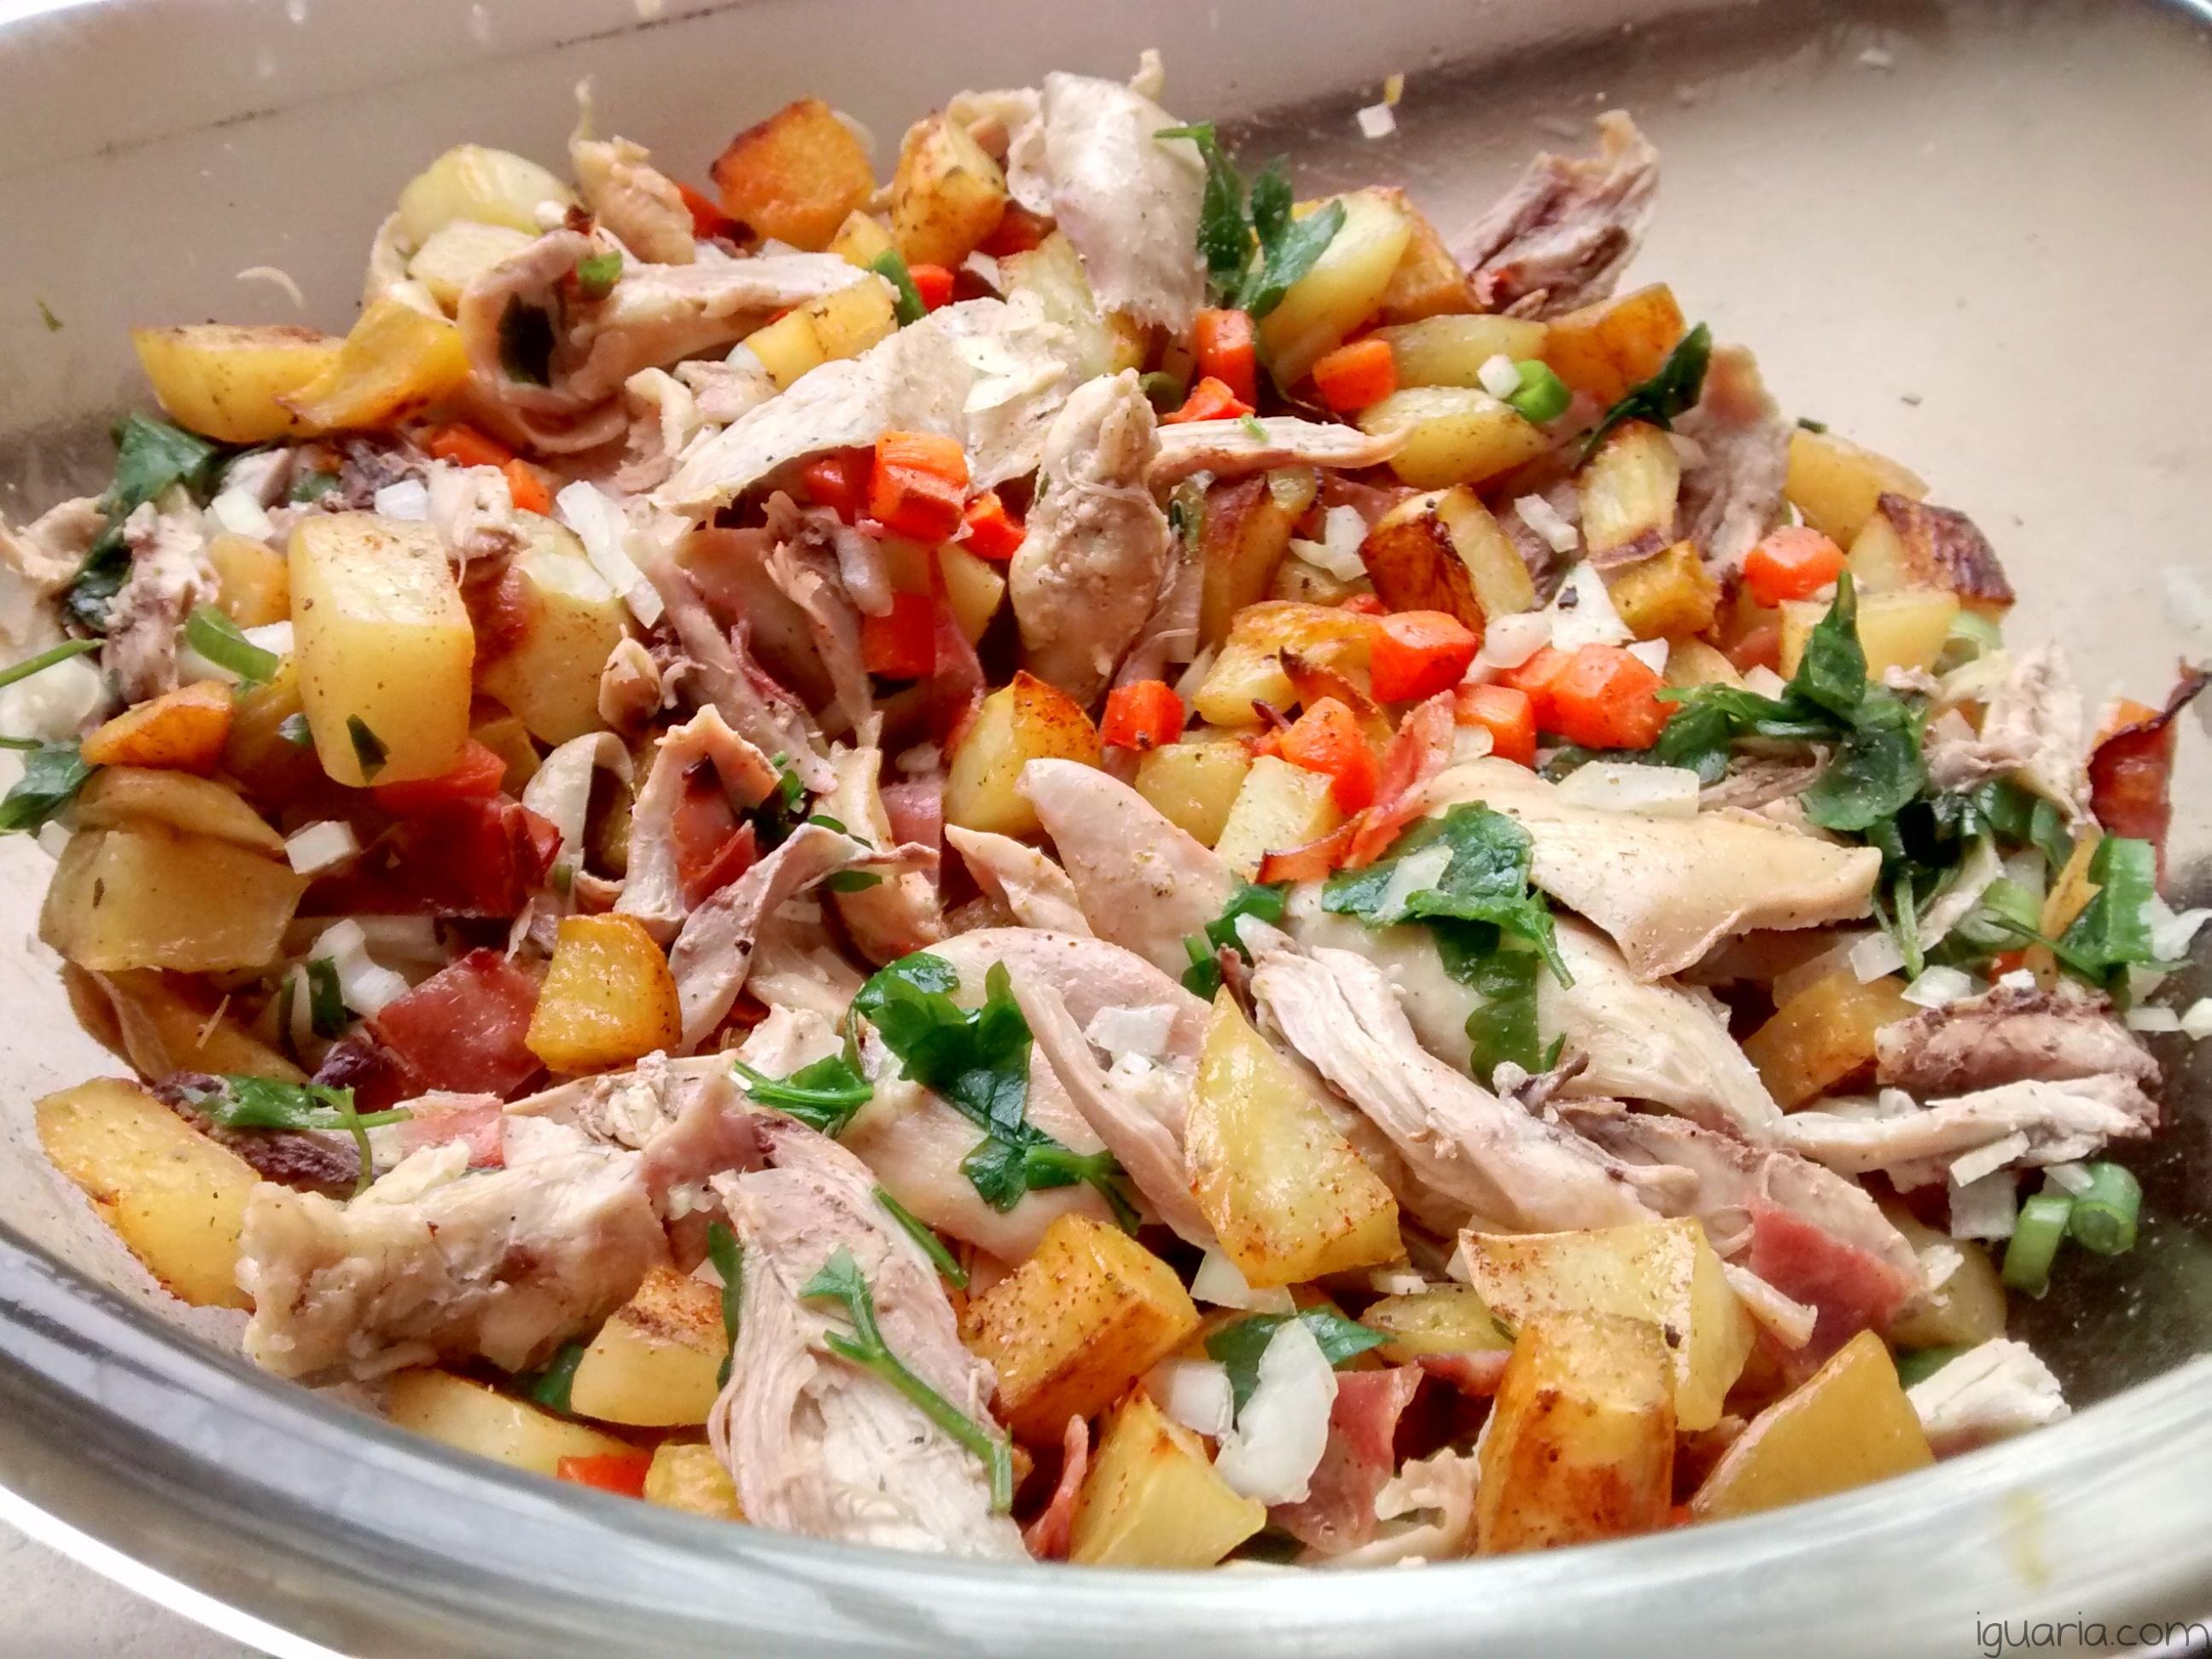 iguaria-salada-de-batata-deliciosa